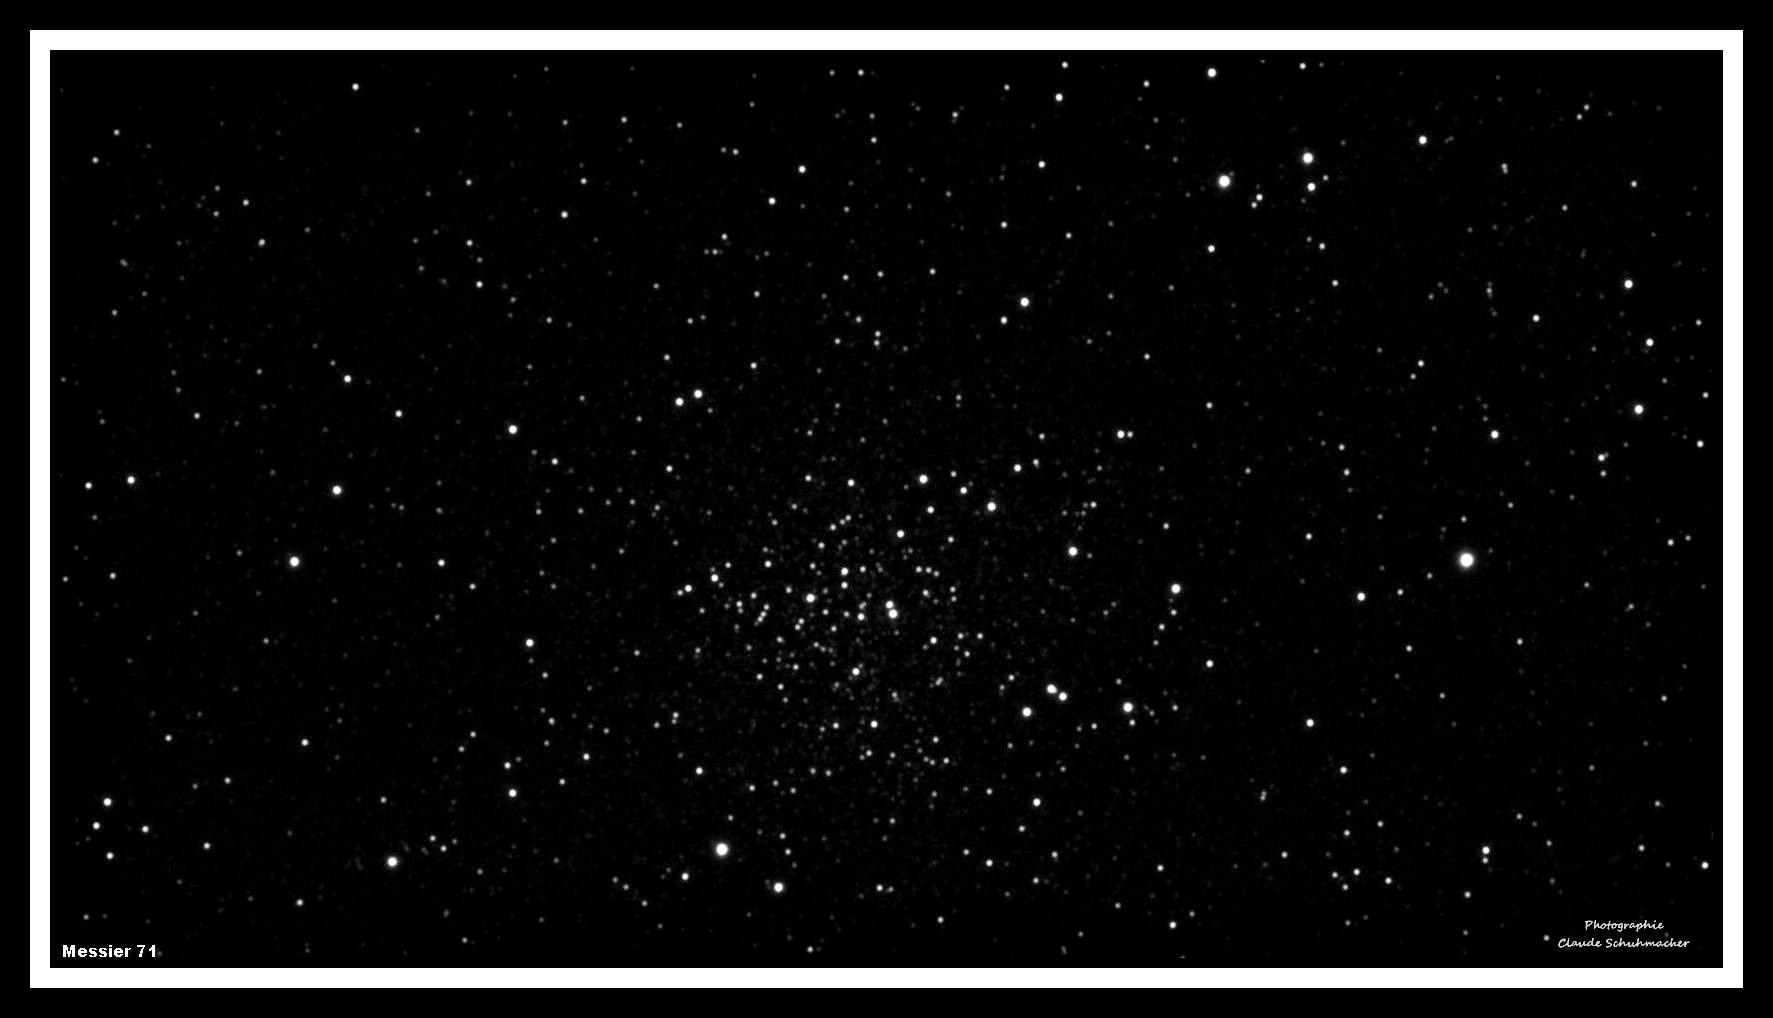 5f6887d2c5bc1_Messier71bis.jpg.c15e19192fc78258016cb2ed807d7214.jpg